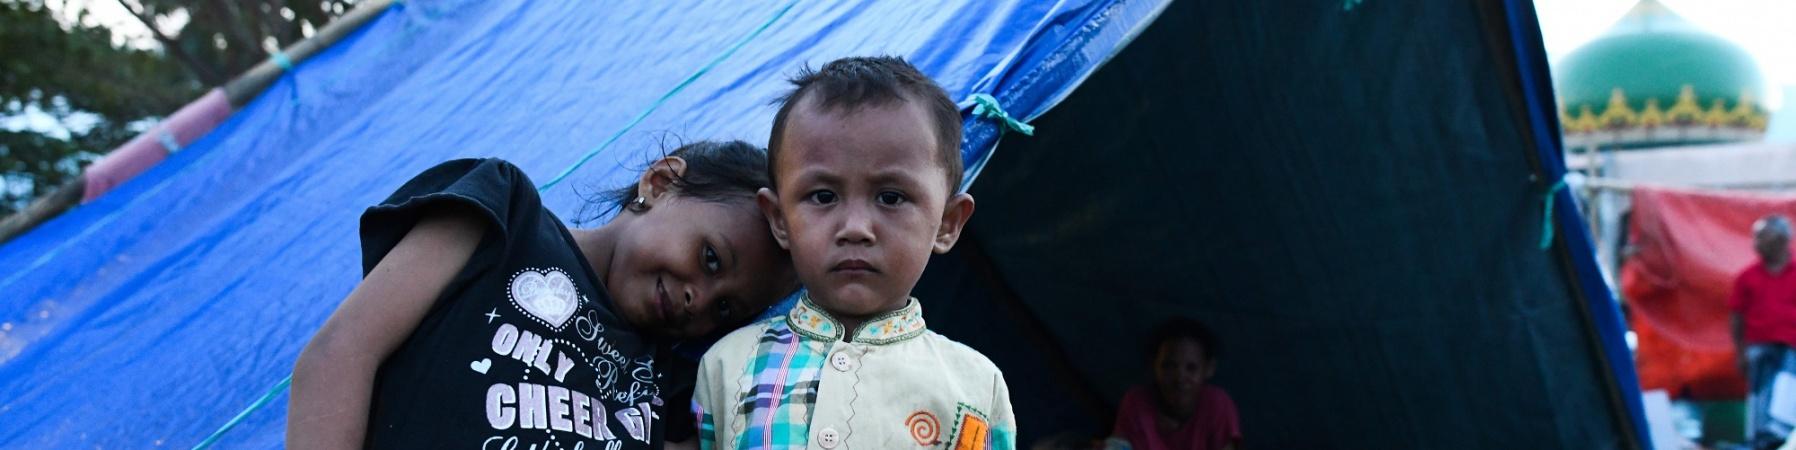 Tsunami Indonesia bambini